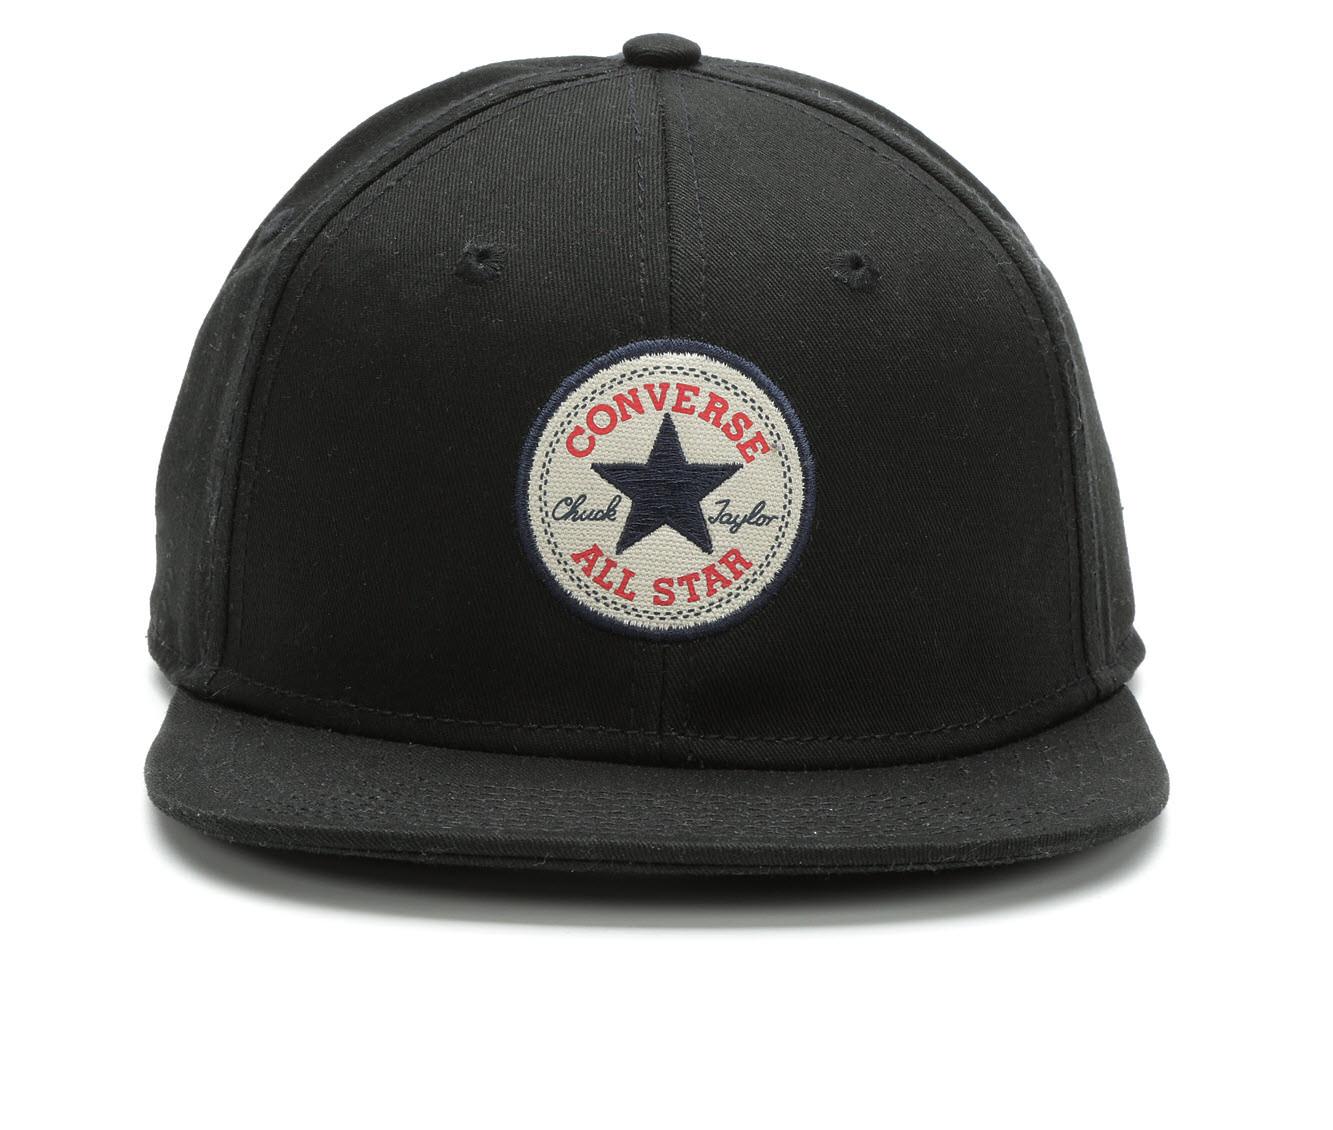 Converse Snapback Flatbill Hat (Black - Size UNSZ) 1663871